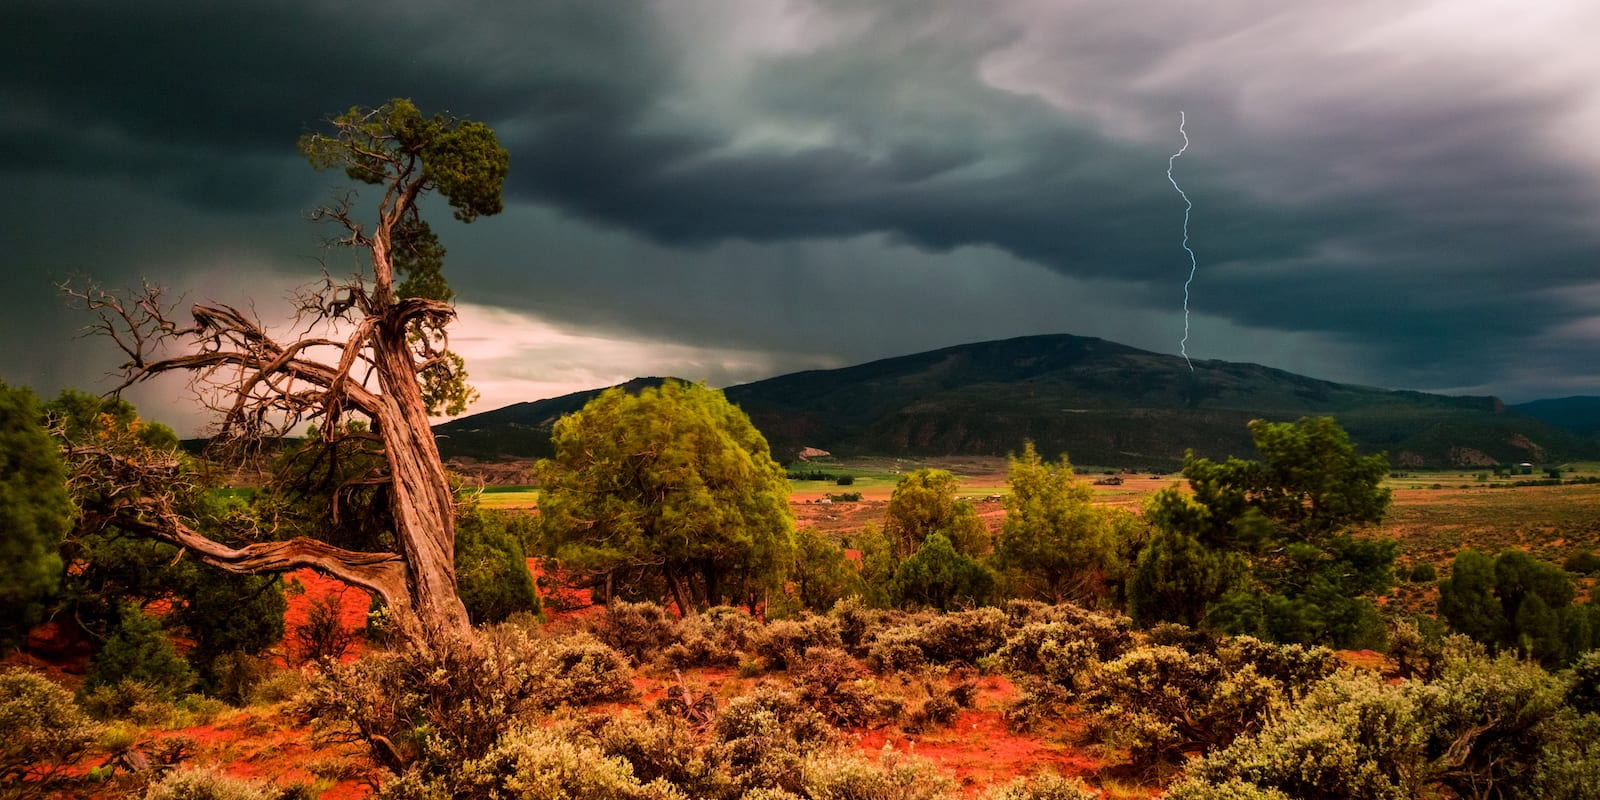 Gypsum CO Summer Lightning Strike on Hardscrabble Mountain